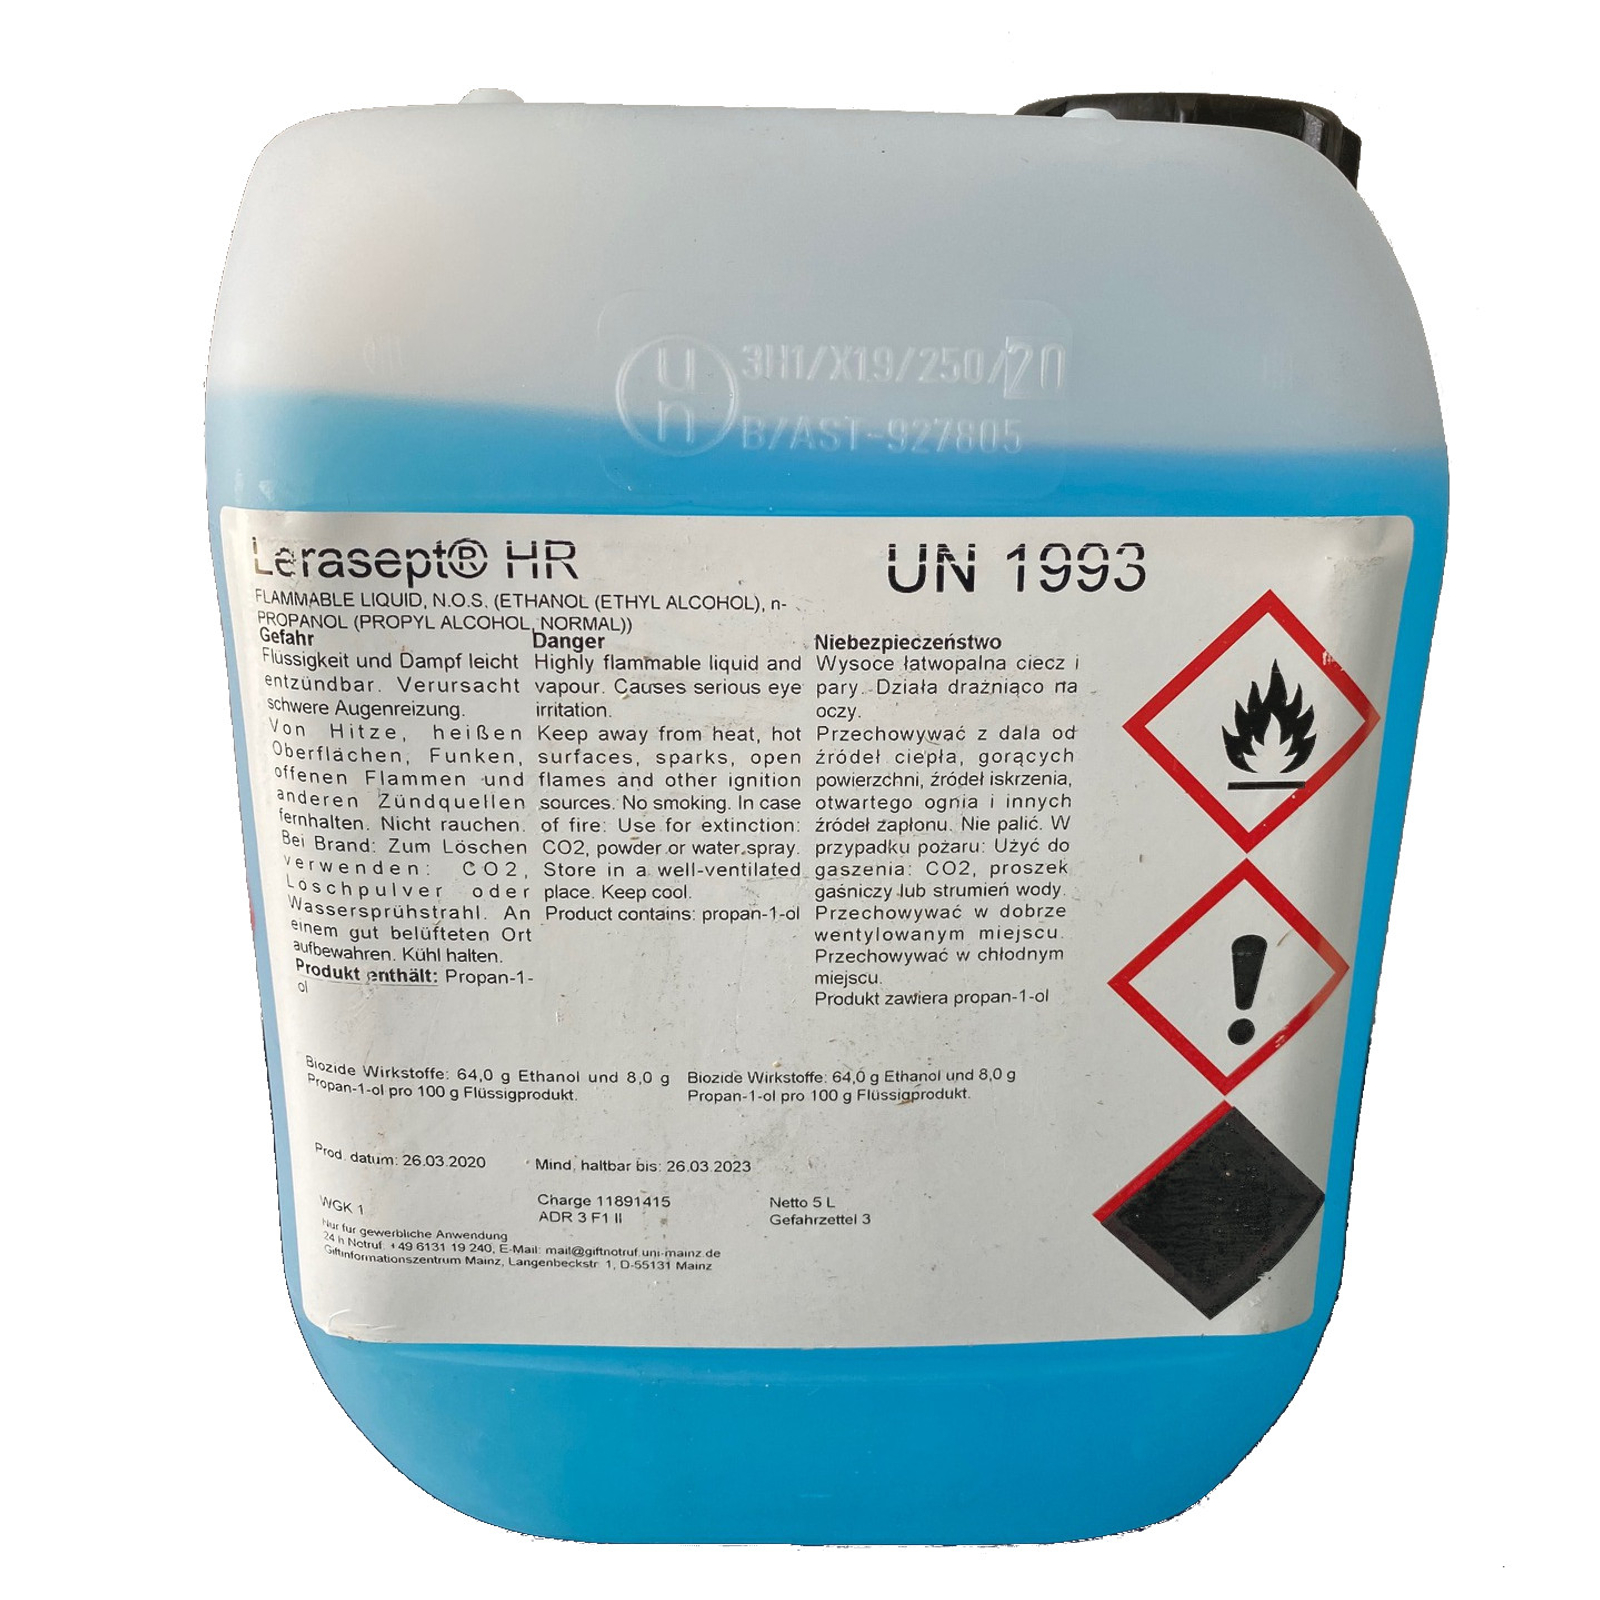 Alkoholisches Handdesinfektionsmittel - Lerasept HR 5l